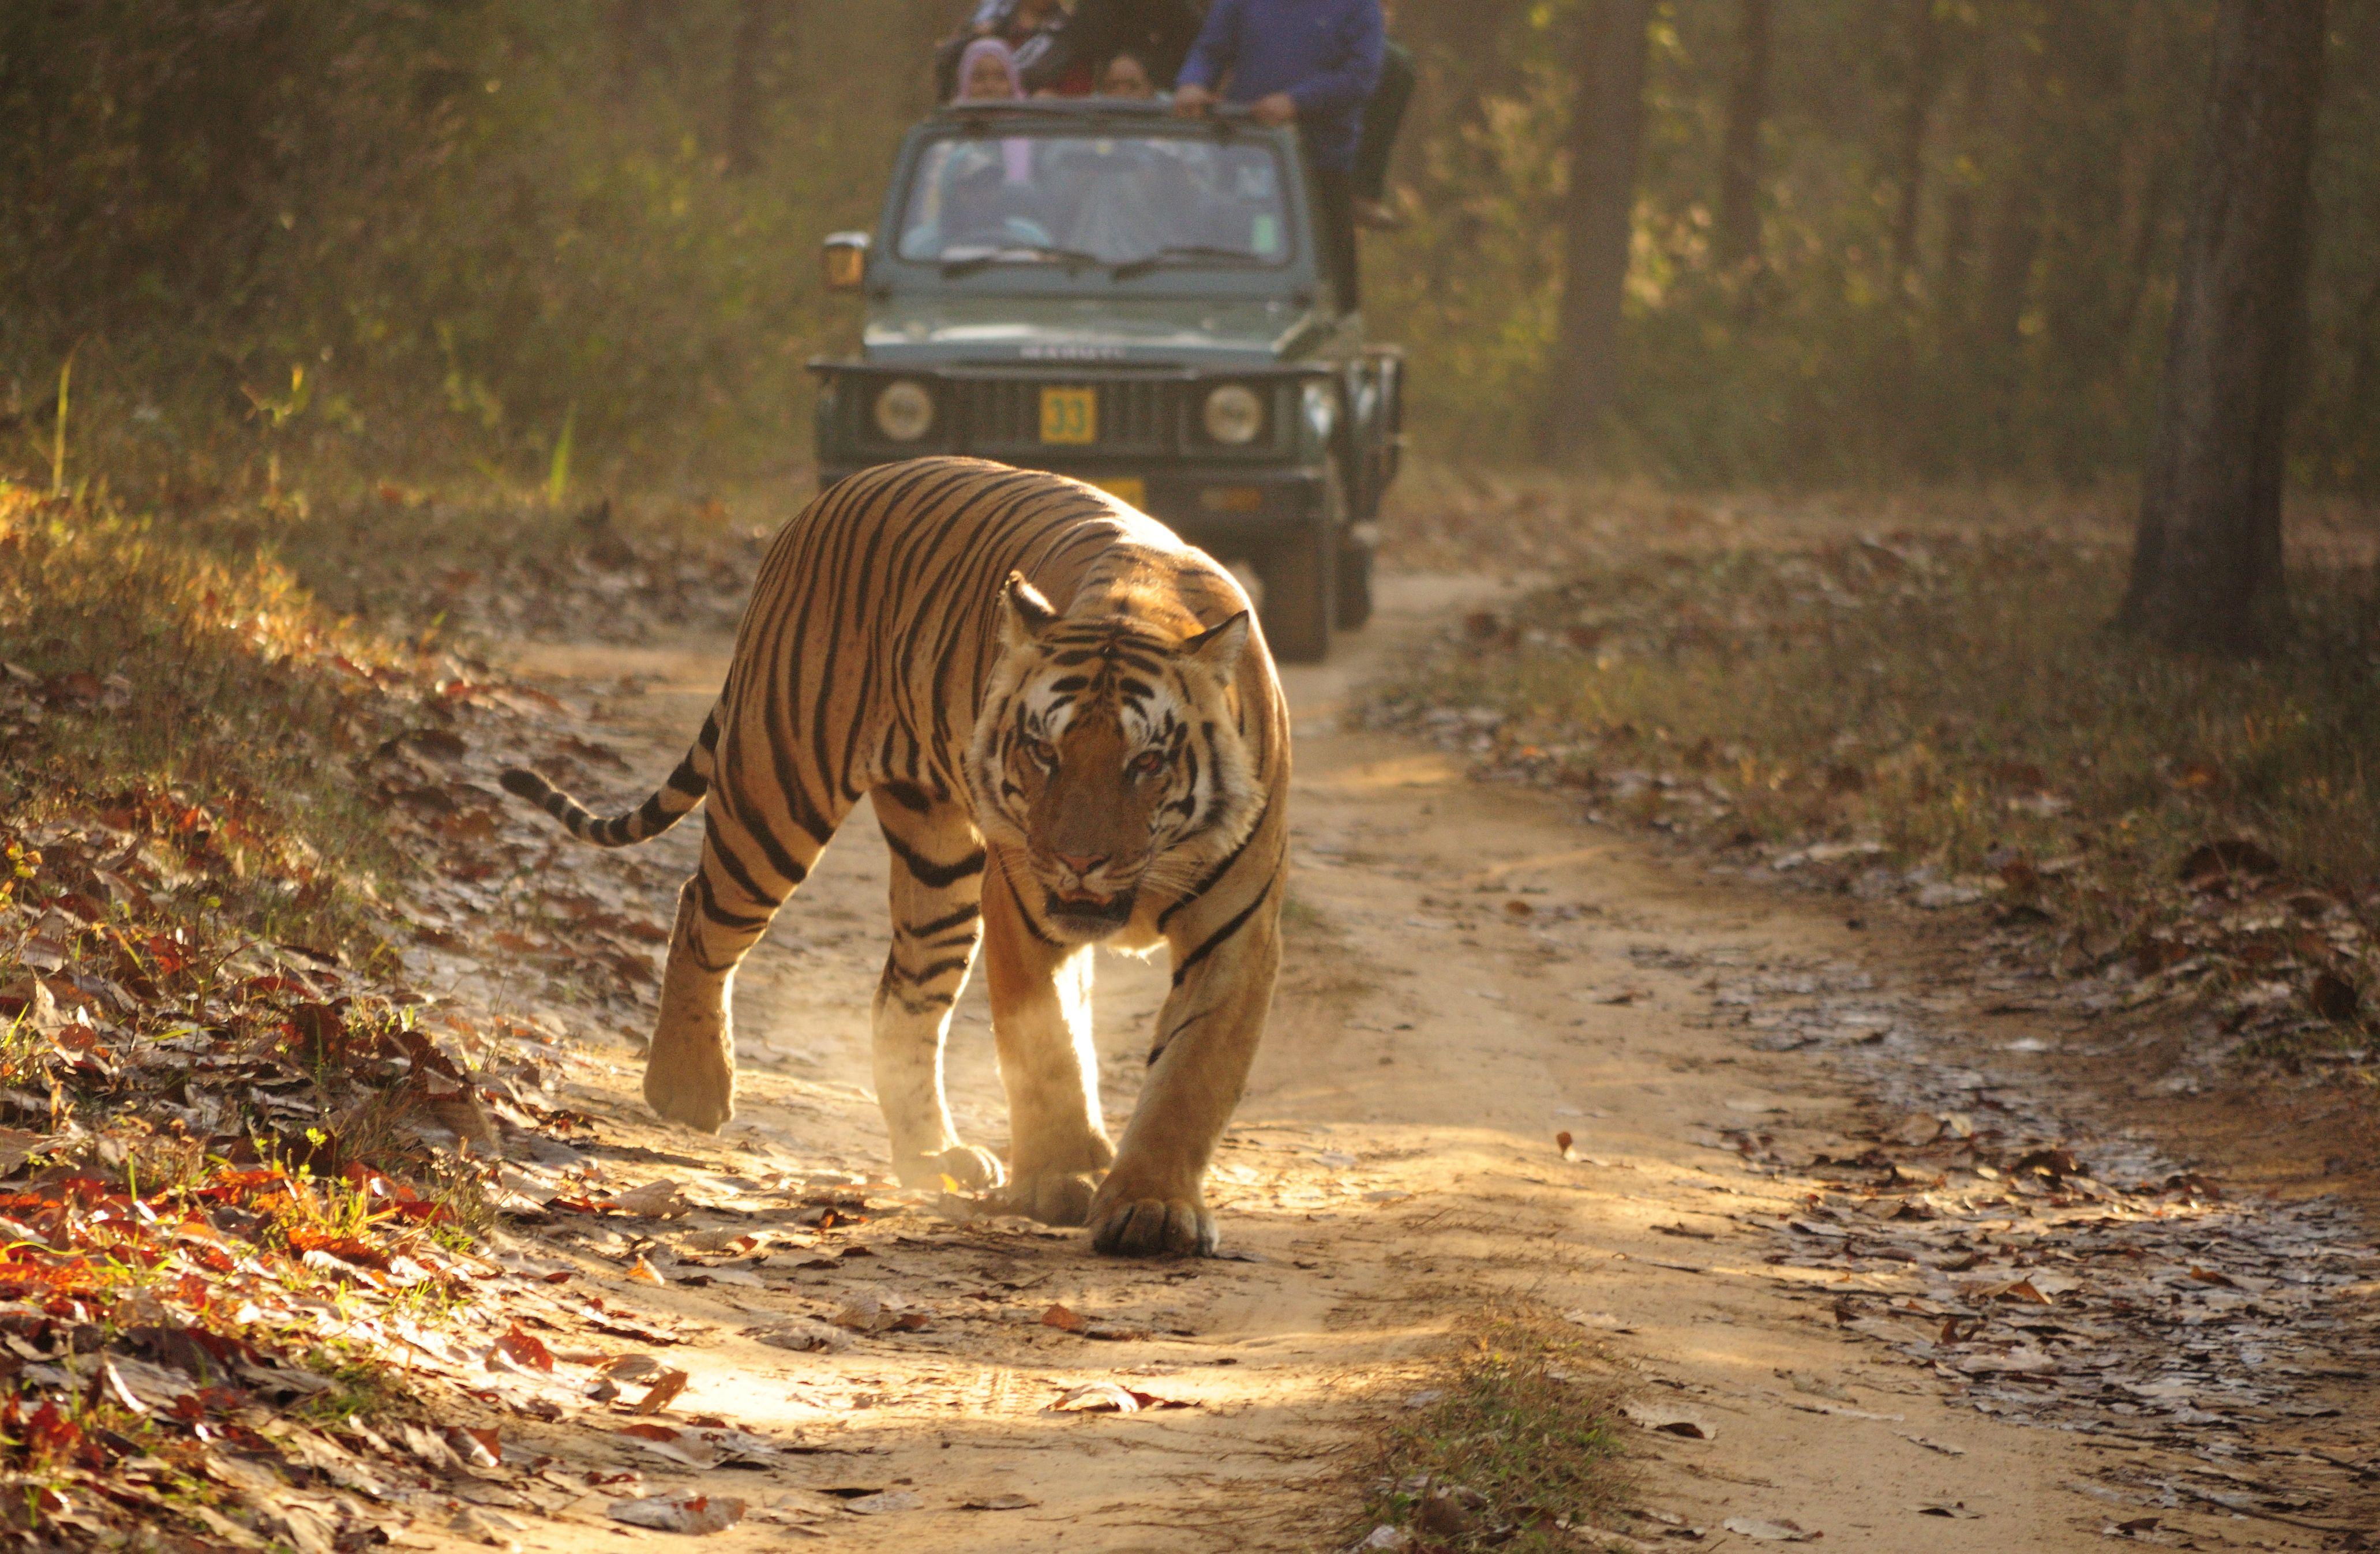 Royal Bengal Tiger in Kanha Tiger Reserve, India